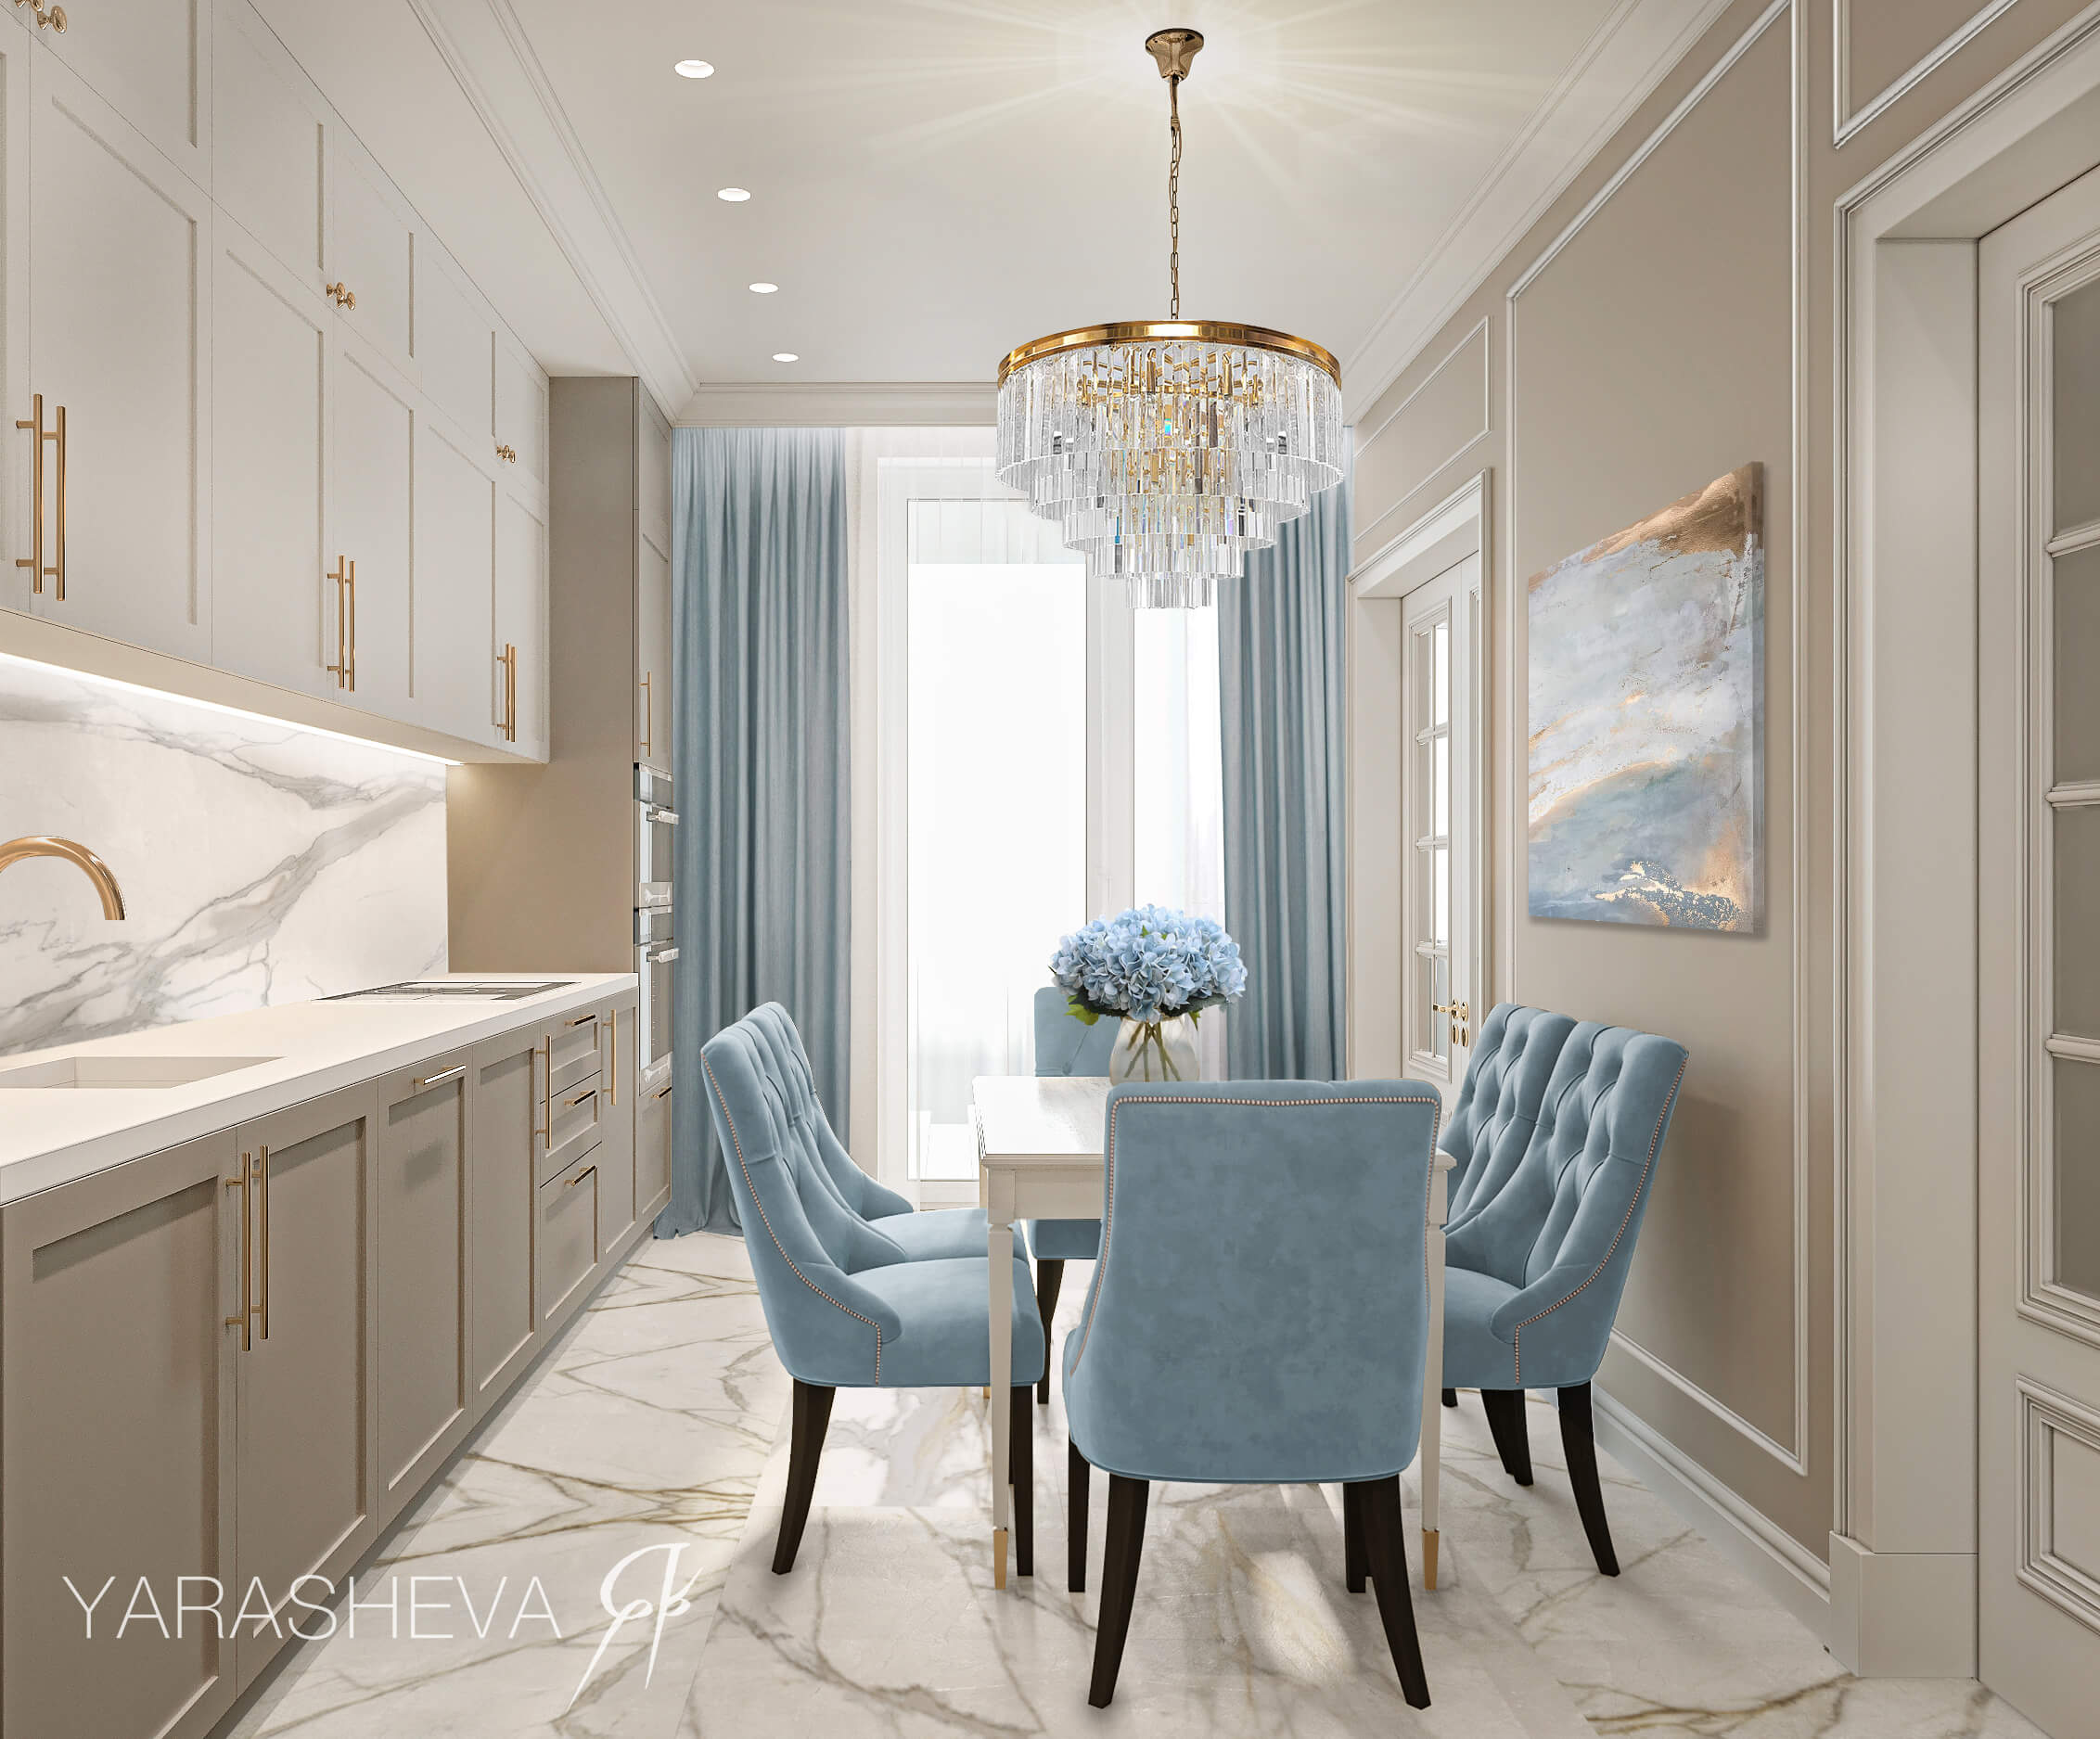 Interior Design Studio - Yarasheva Design Studio